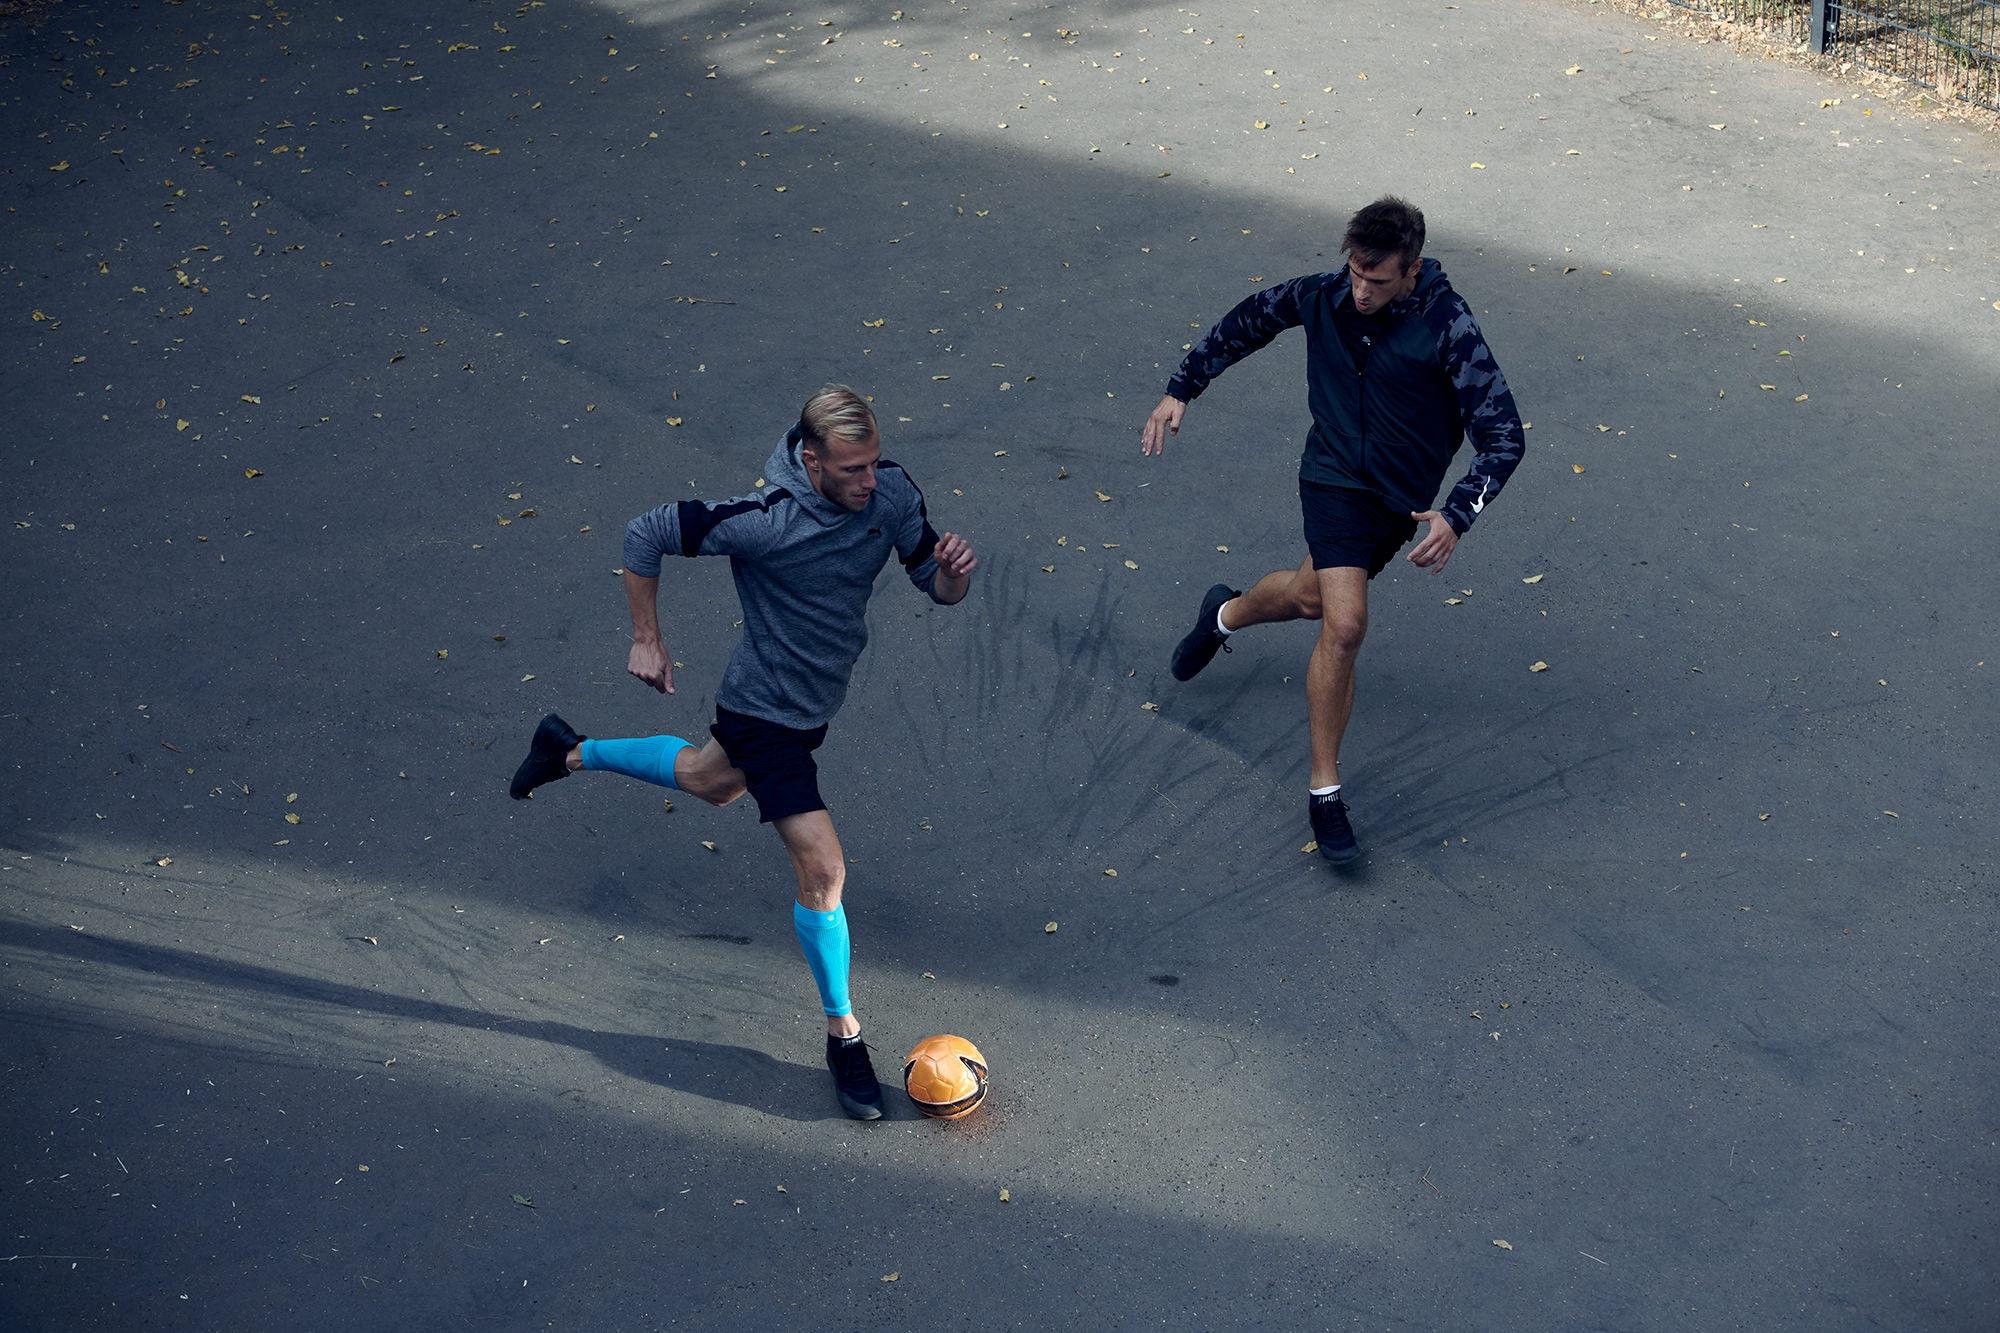 sonjamueller_lifestyle-sport_soccer_0213